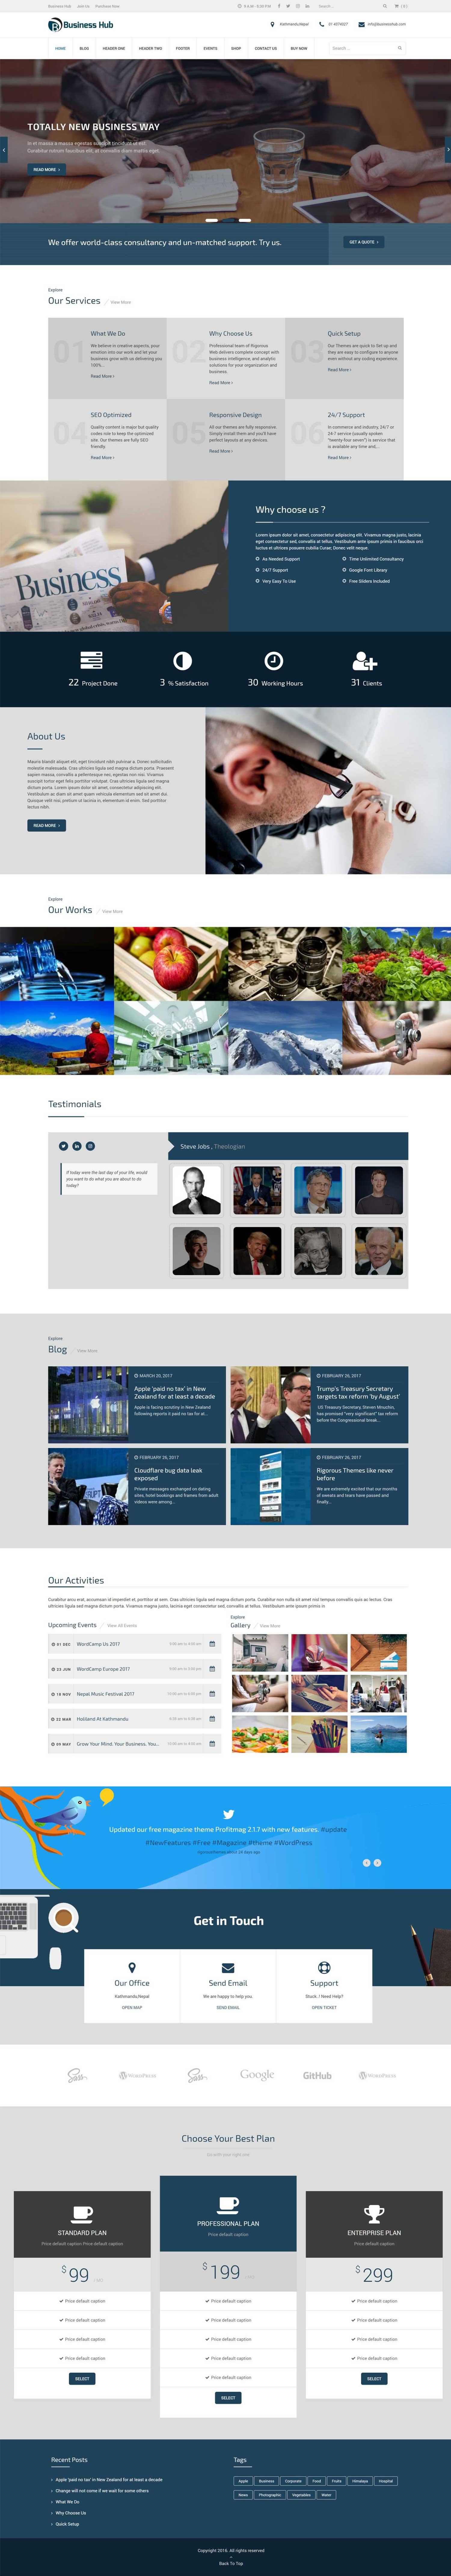 Business Hub Pro